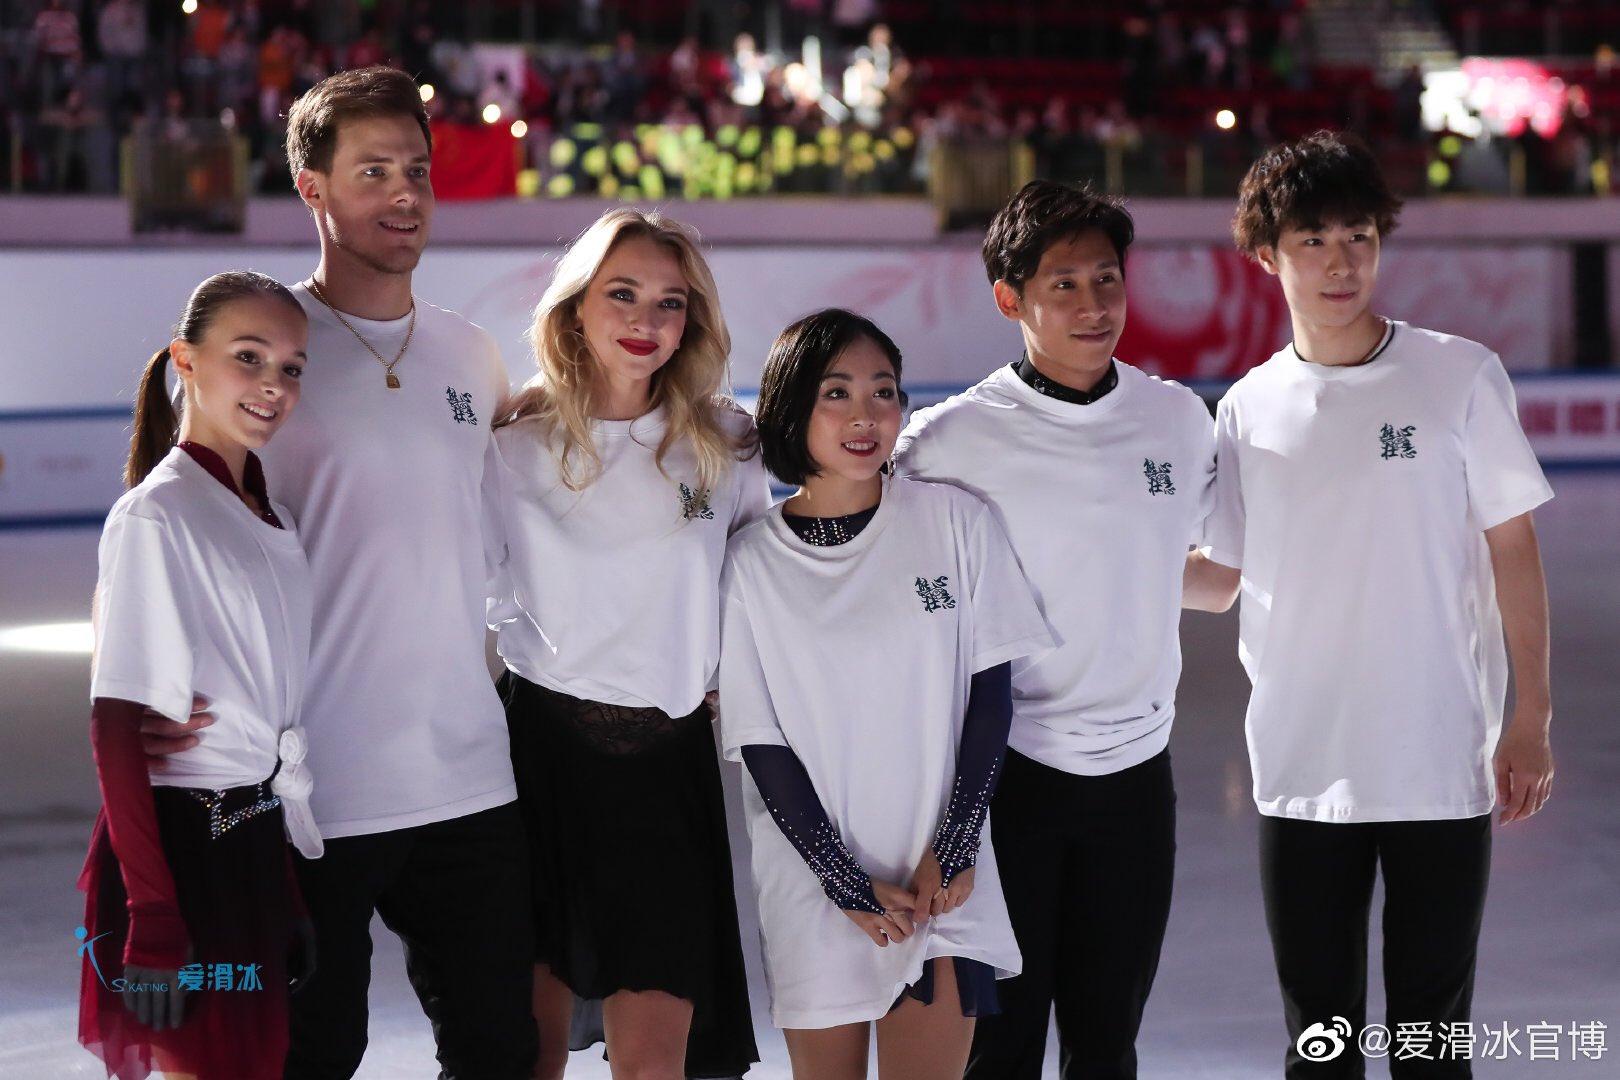 GP - 4 этап. Cup of China Chongqing / CHN November 8-10, 2019 - Страница 14 EJB_HrfWkAIxT98?format=jpg&name=large